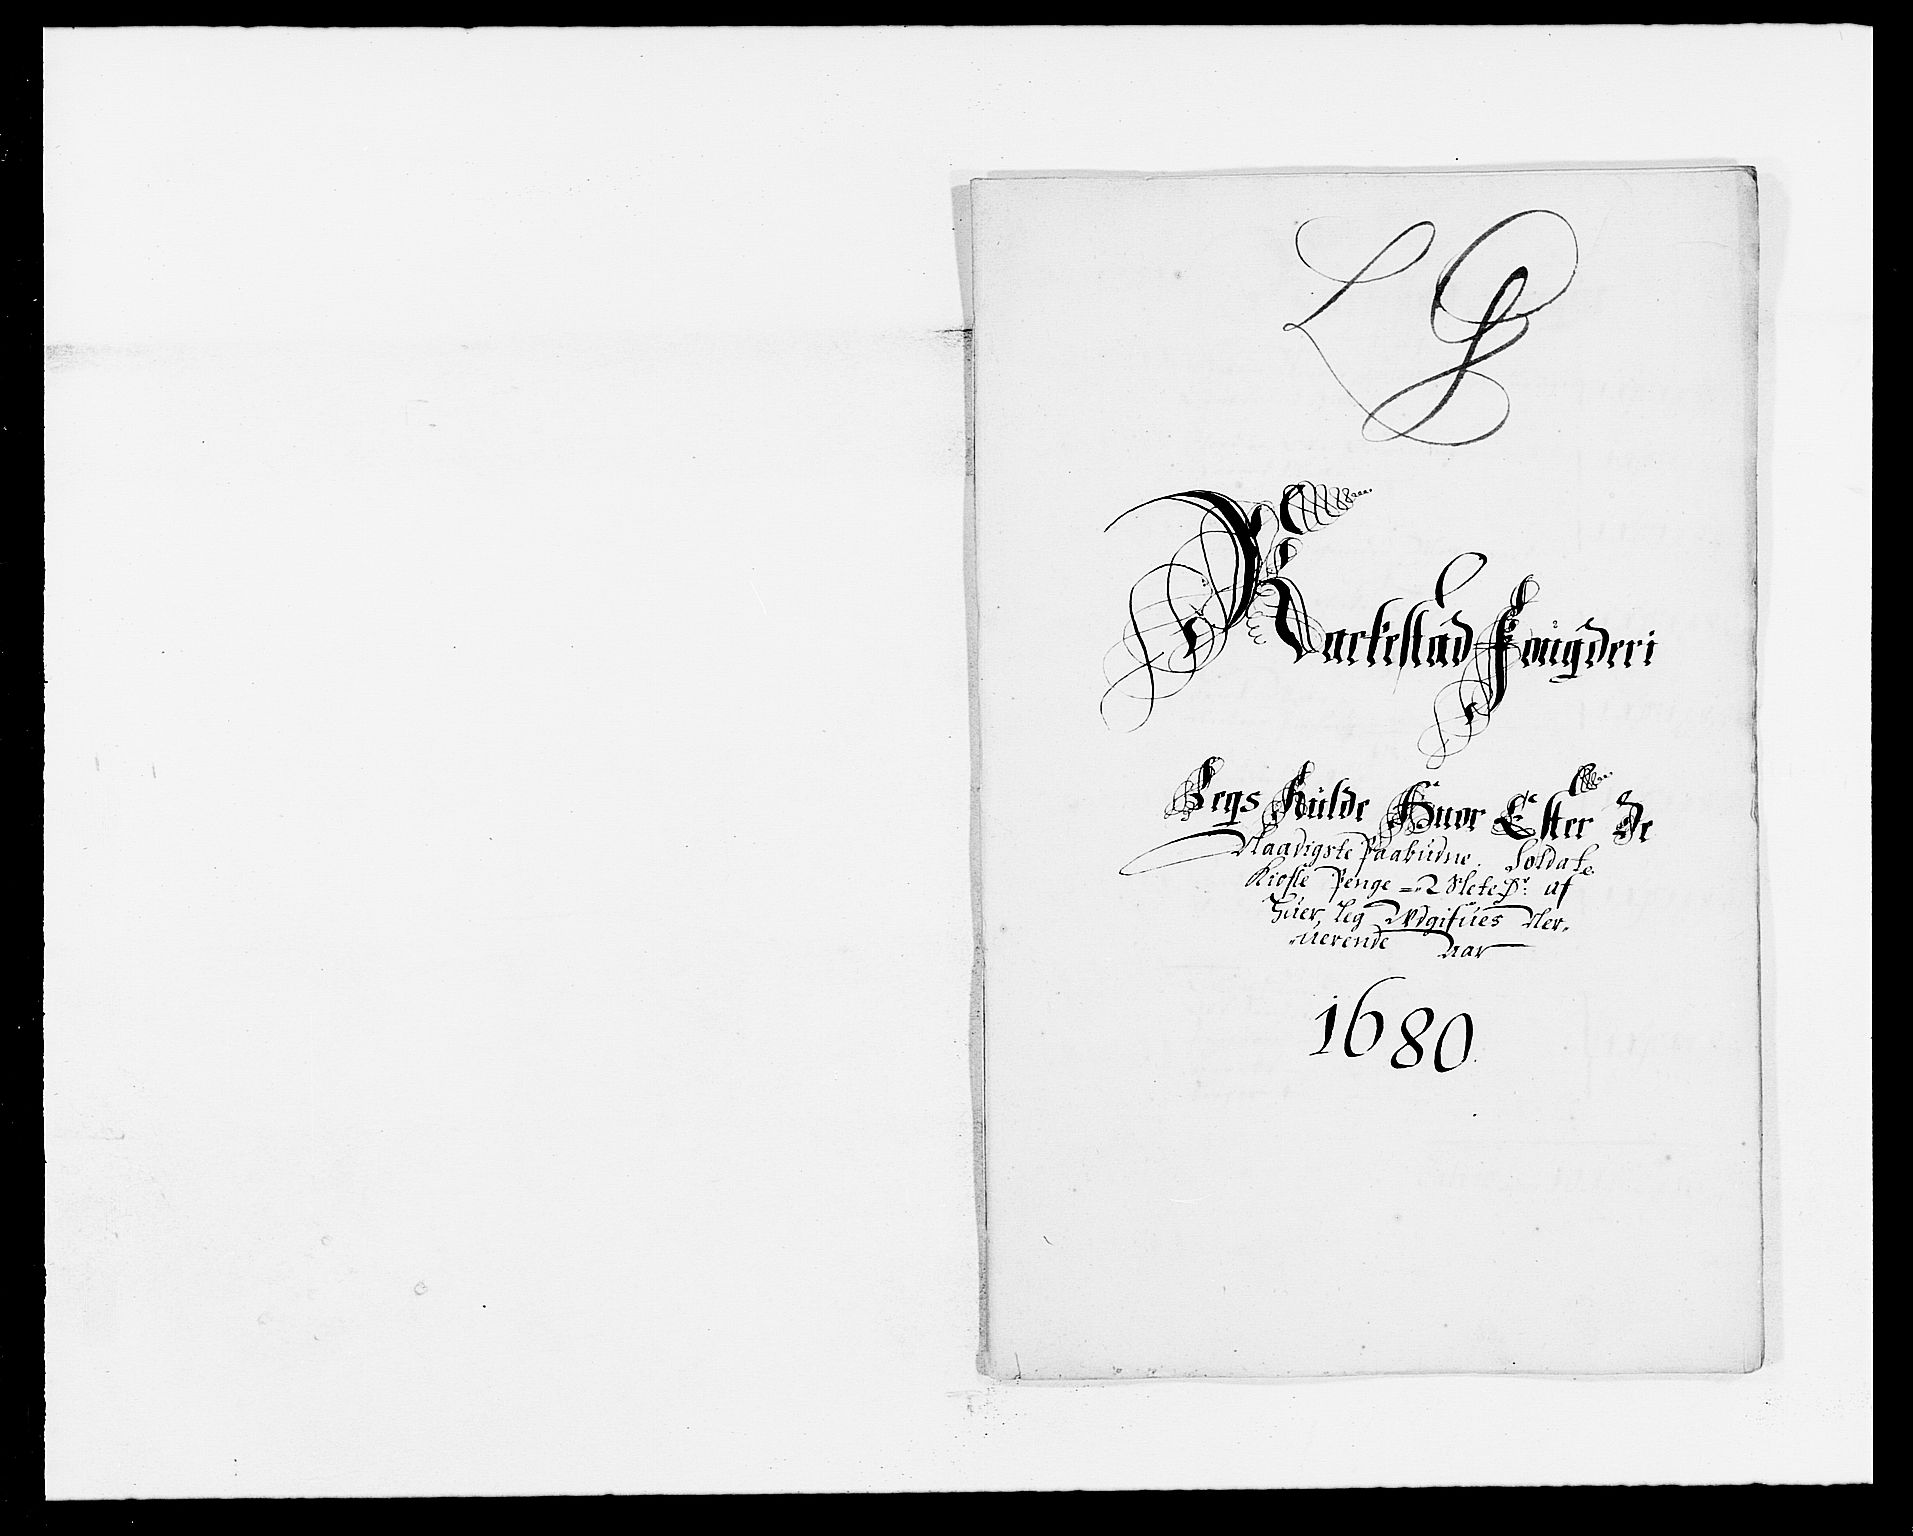 RA, Rentekammeret inntil 1814, Reviderte regnskaper, Fogderegnskap, R05/L0272: Fogderegnskap Rakkestad, 1680-1681, s. 188